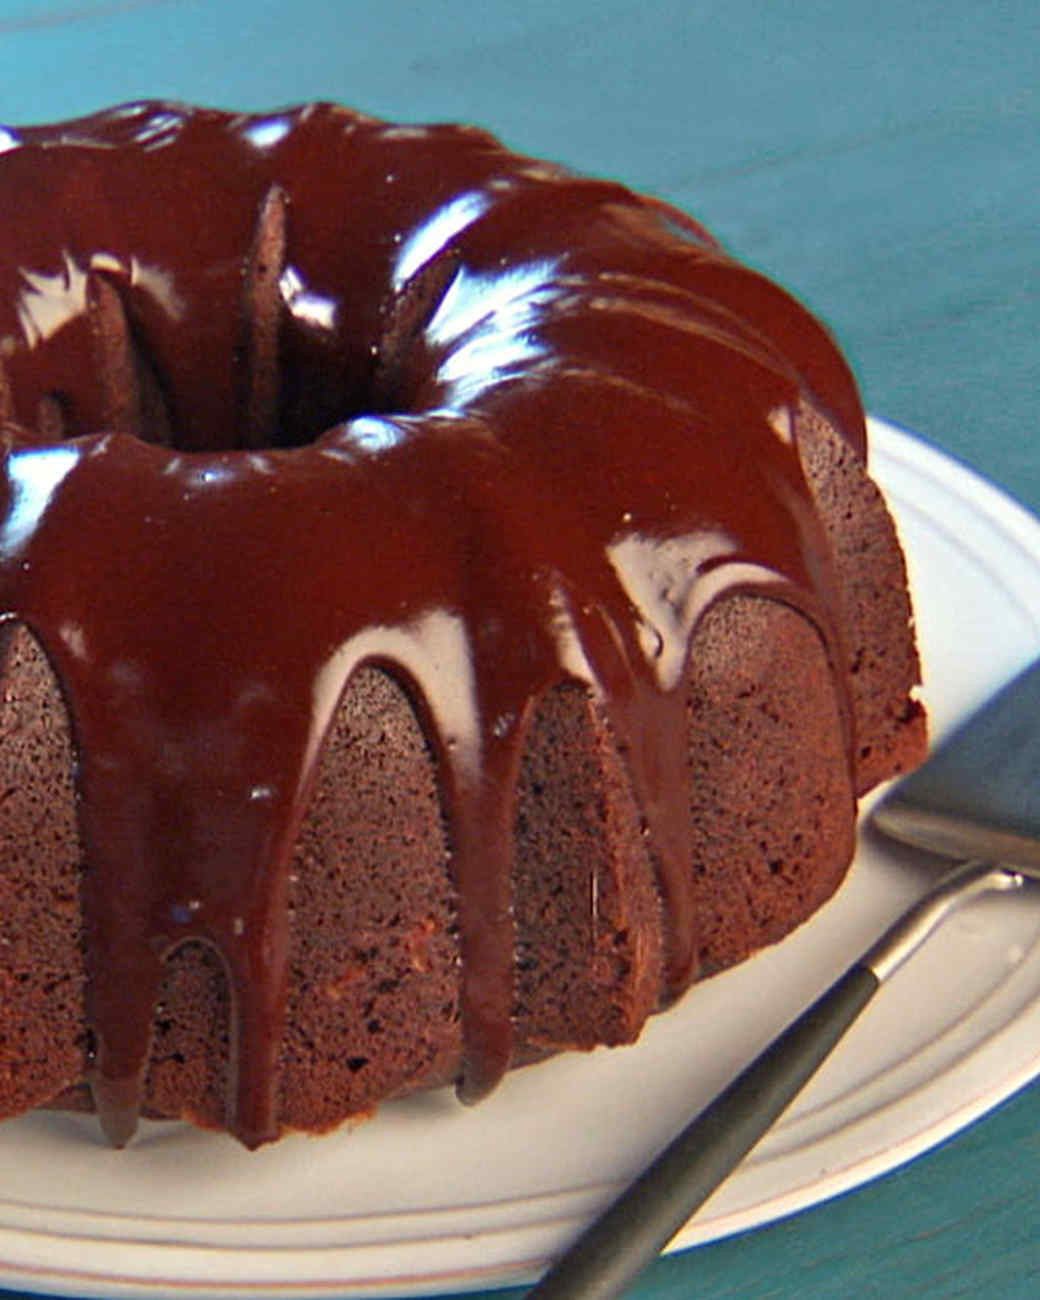 Martha Stewart Chocolate Cake  Dolly s Chocolate Bundt Cake Recipe & Video